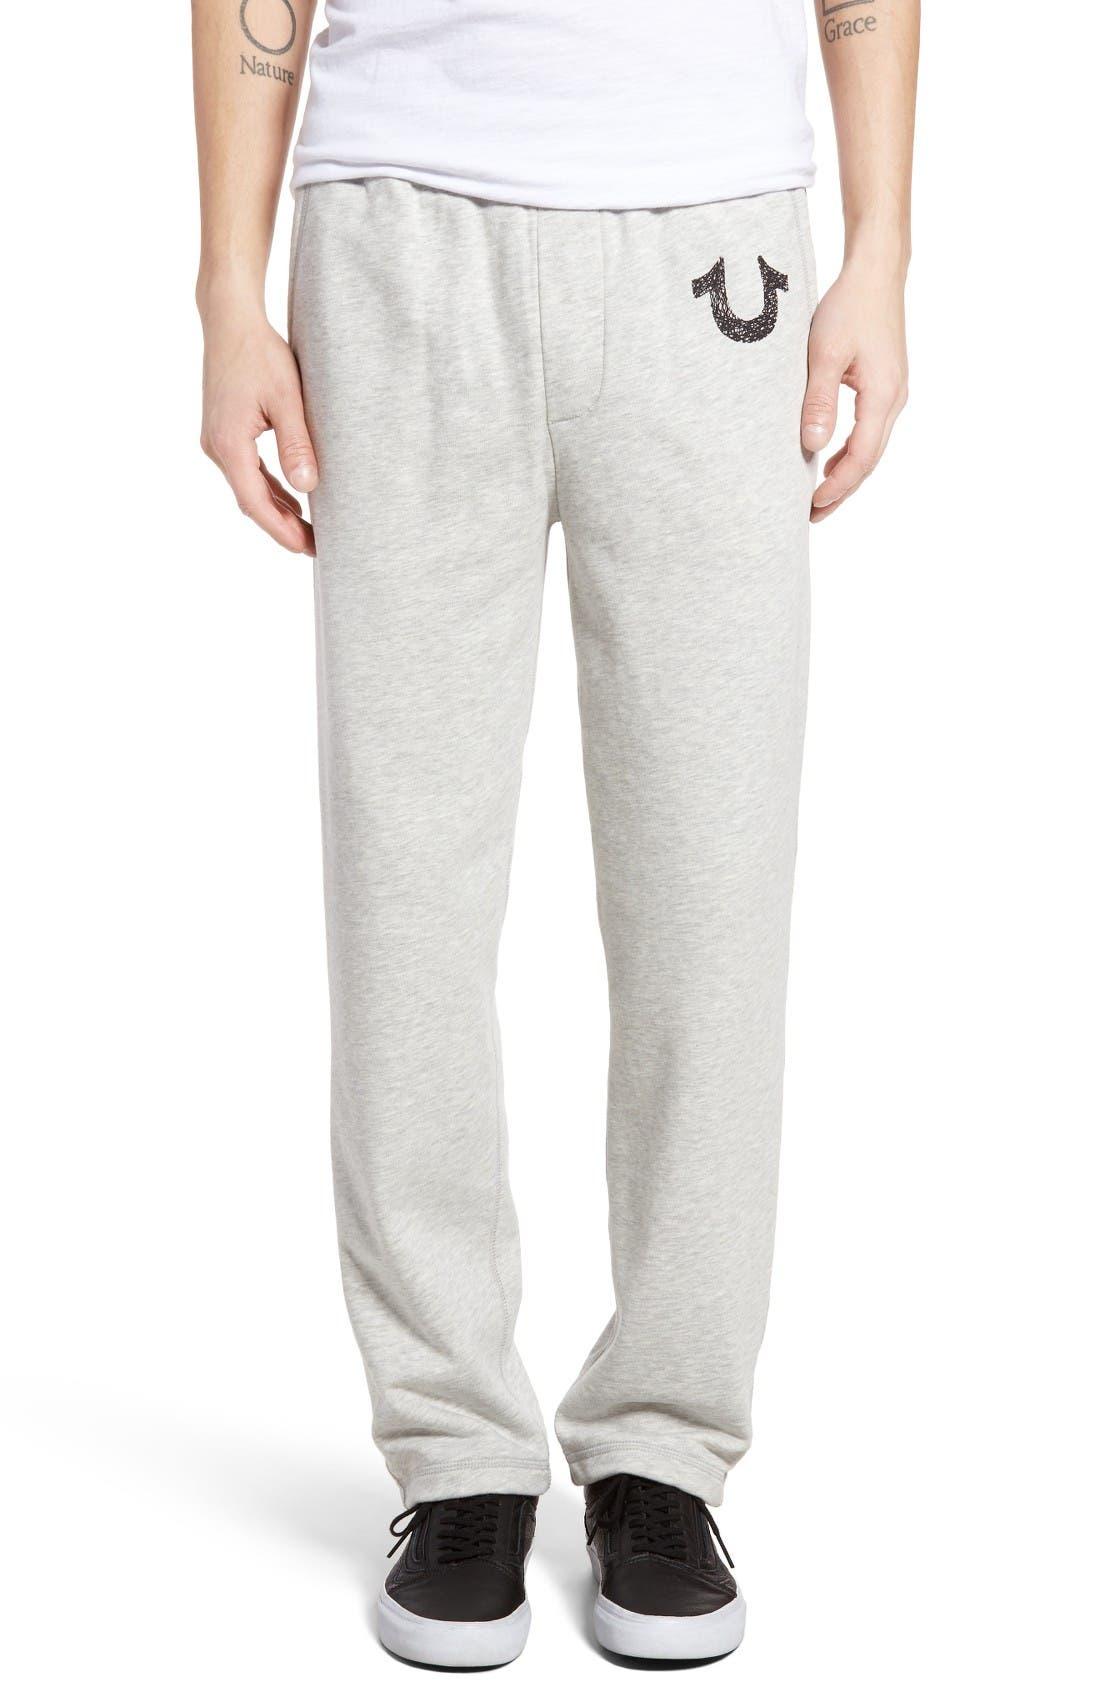 Main Image - True Religion Brand Jeans Open Leg Sweatpants